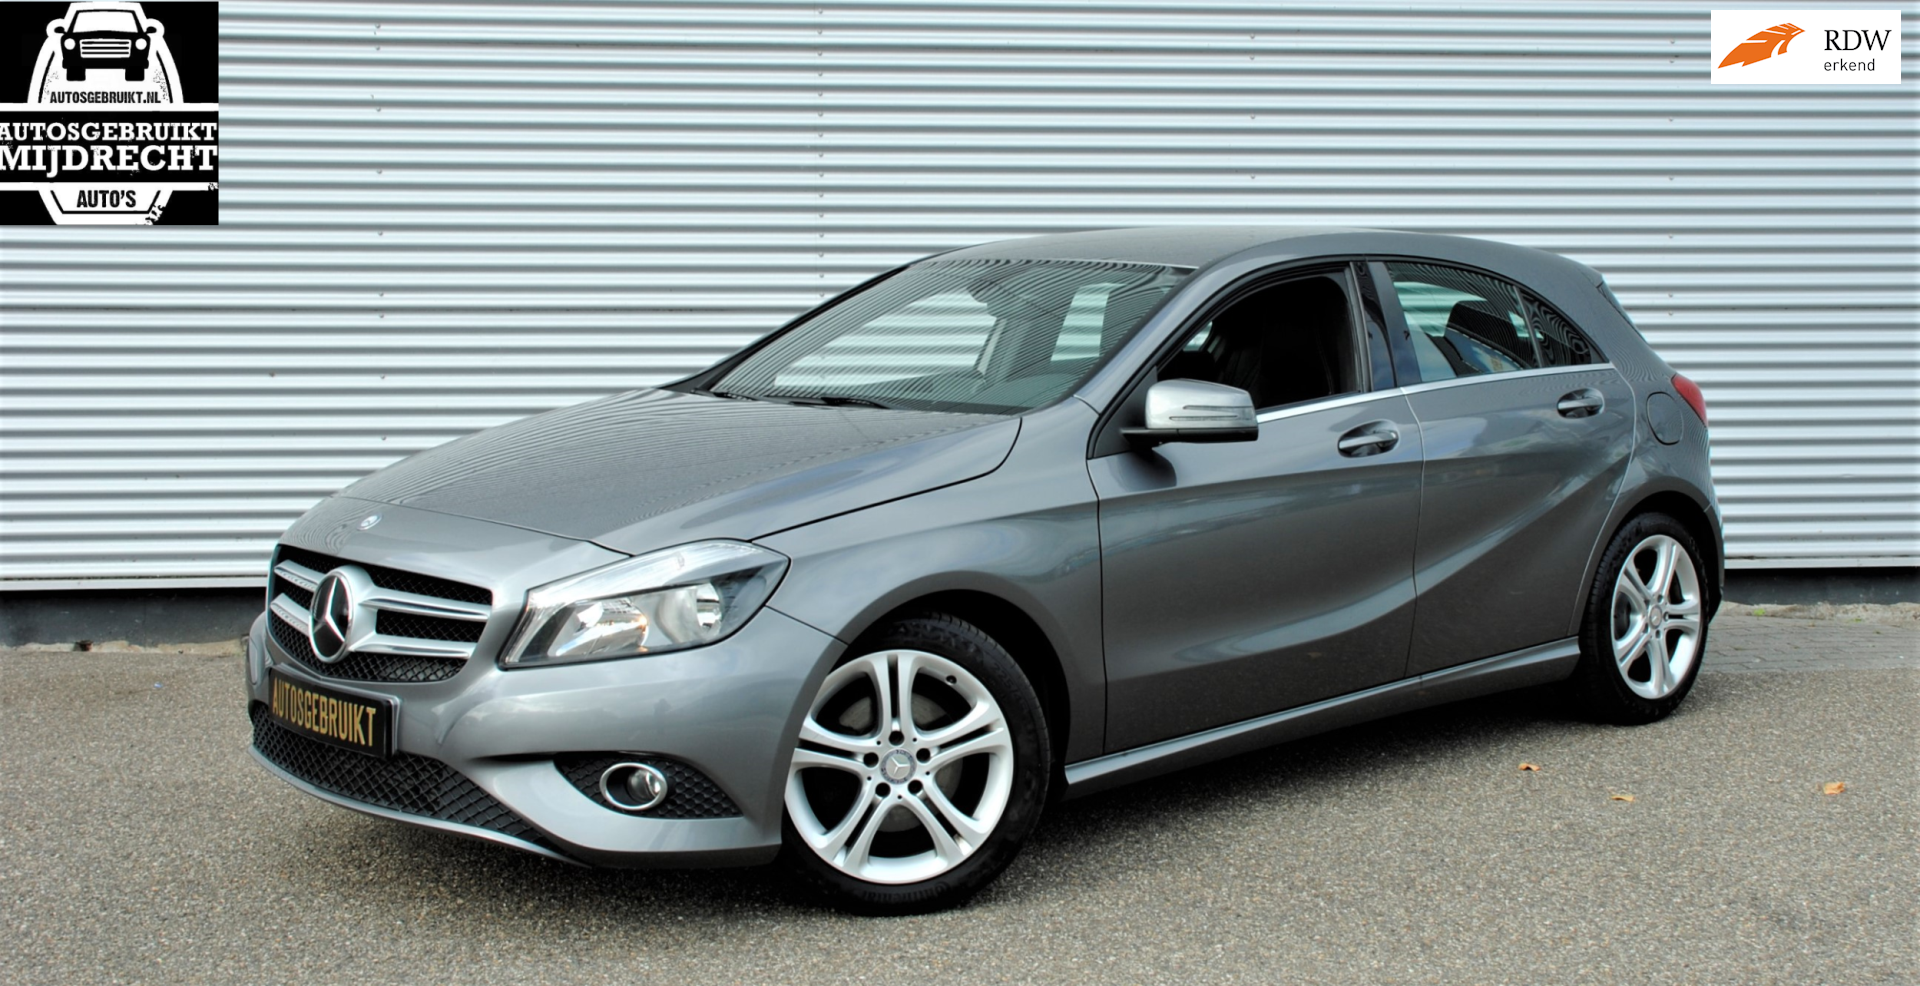 Mercedes-Benz A-klasse occasion - Autosgebruikt Mijdrecht